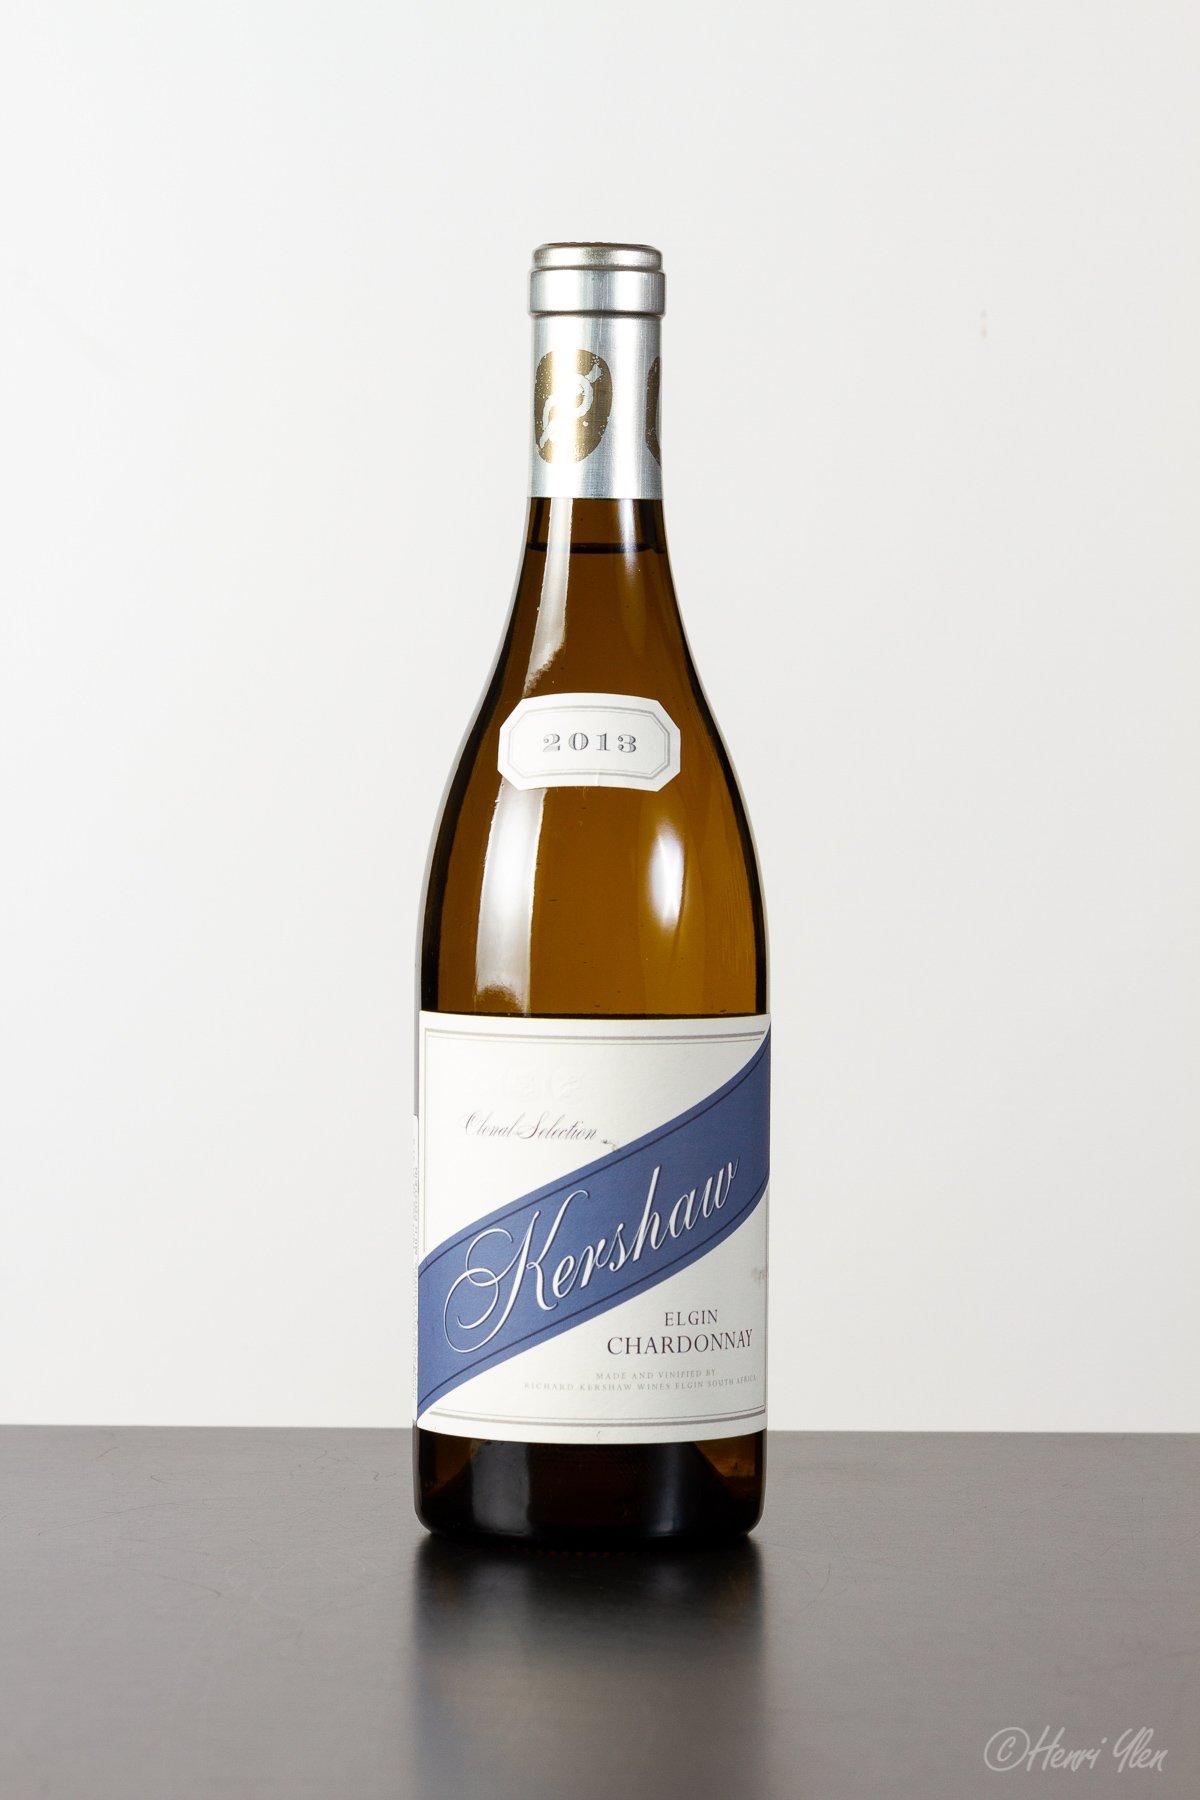 Kershaw Chardonnay